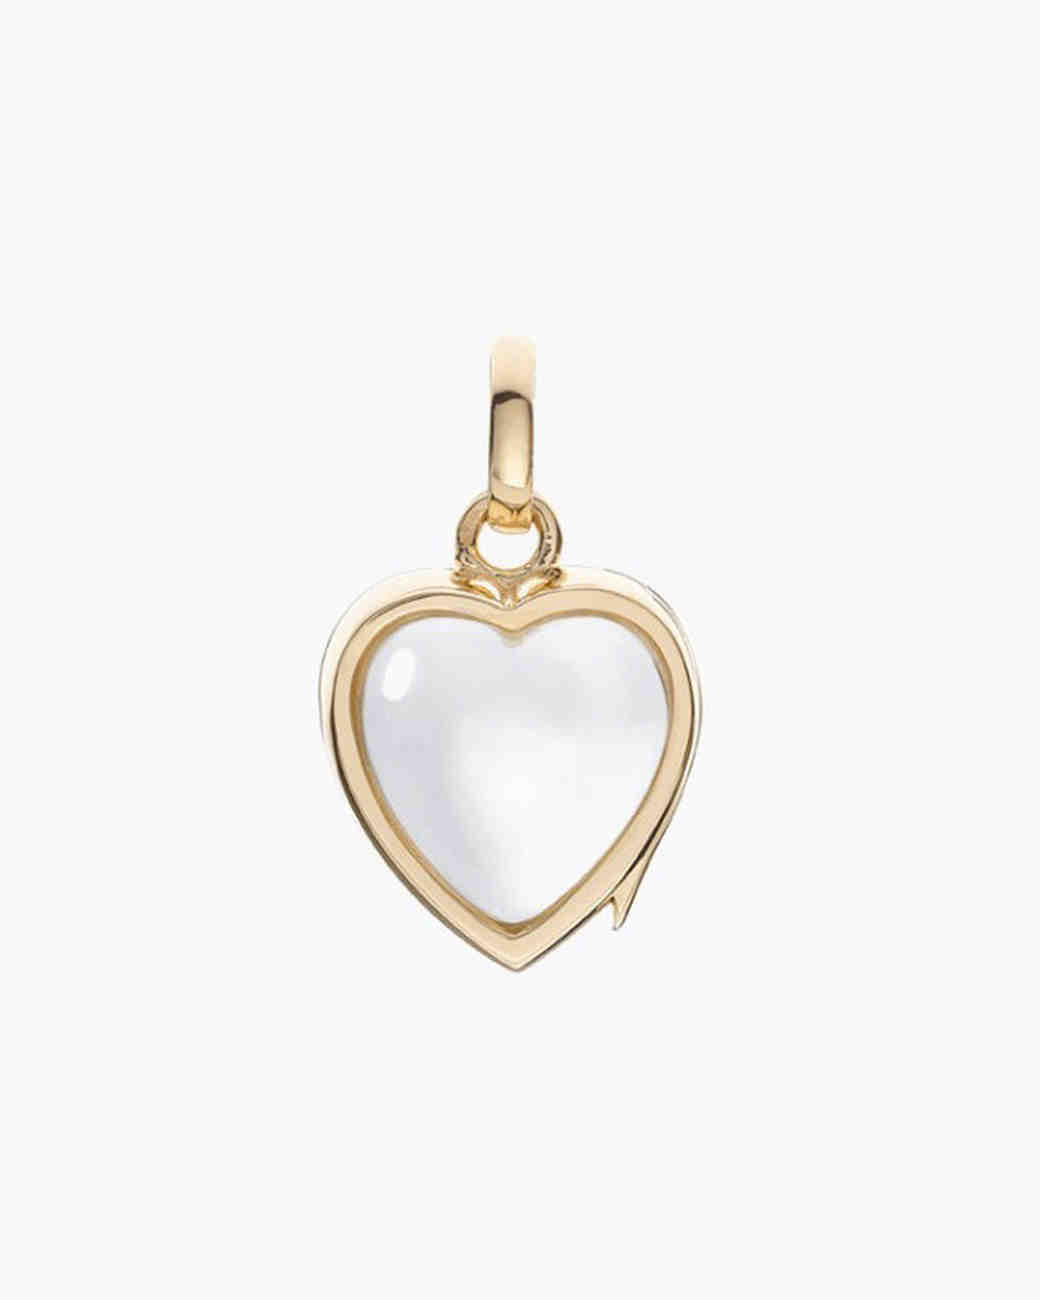 Small Heart Locket Necklace